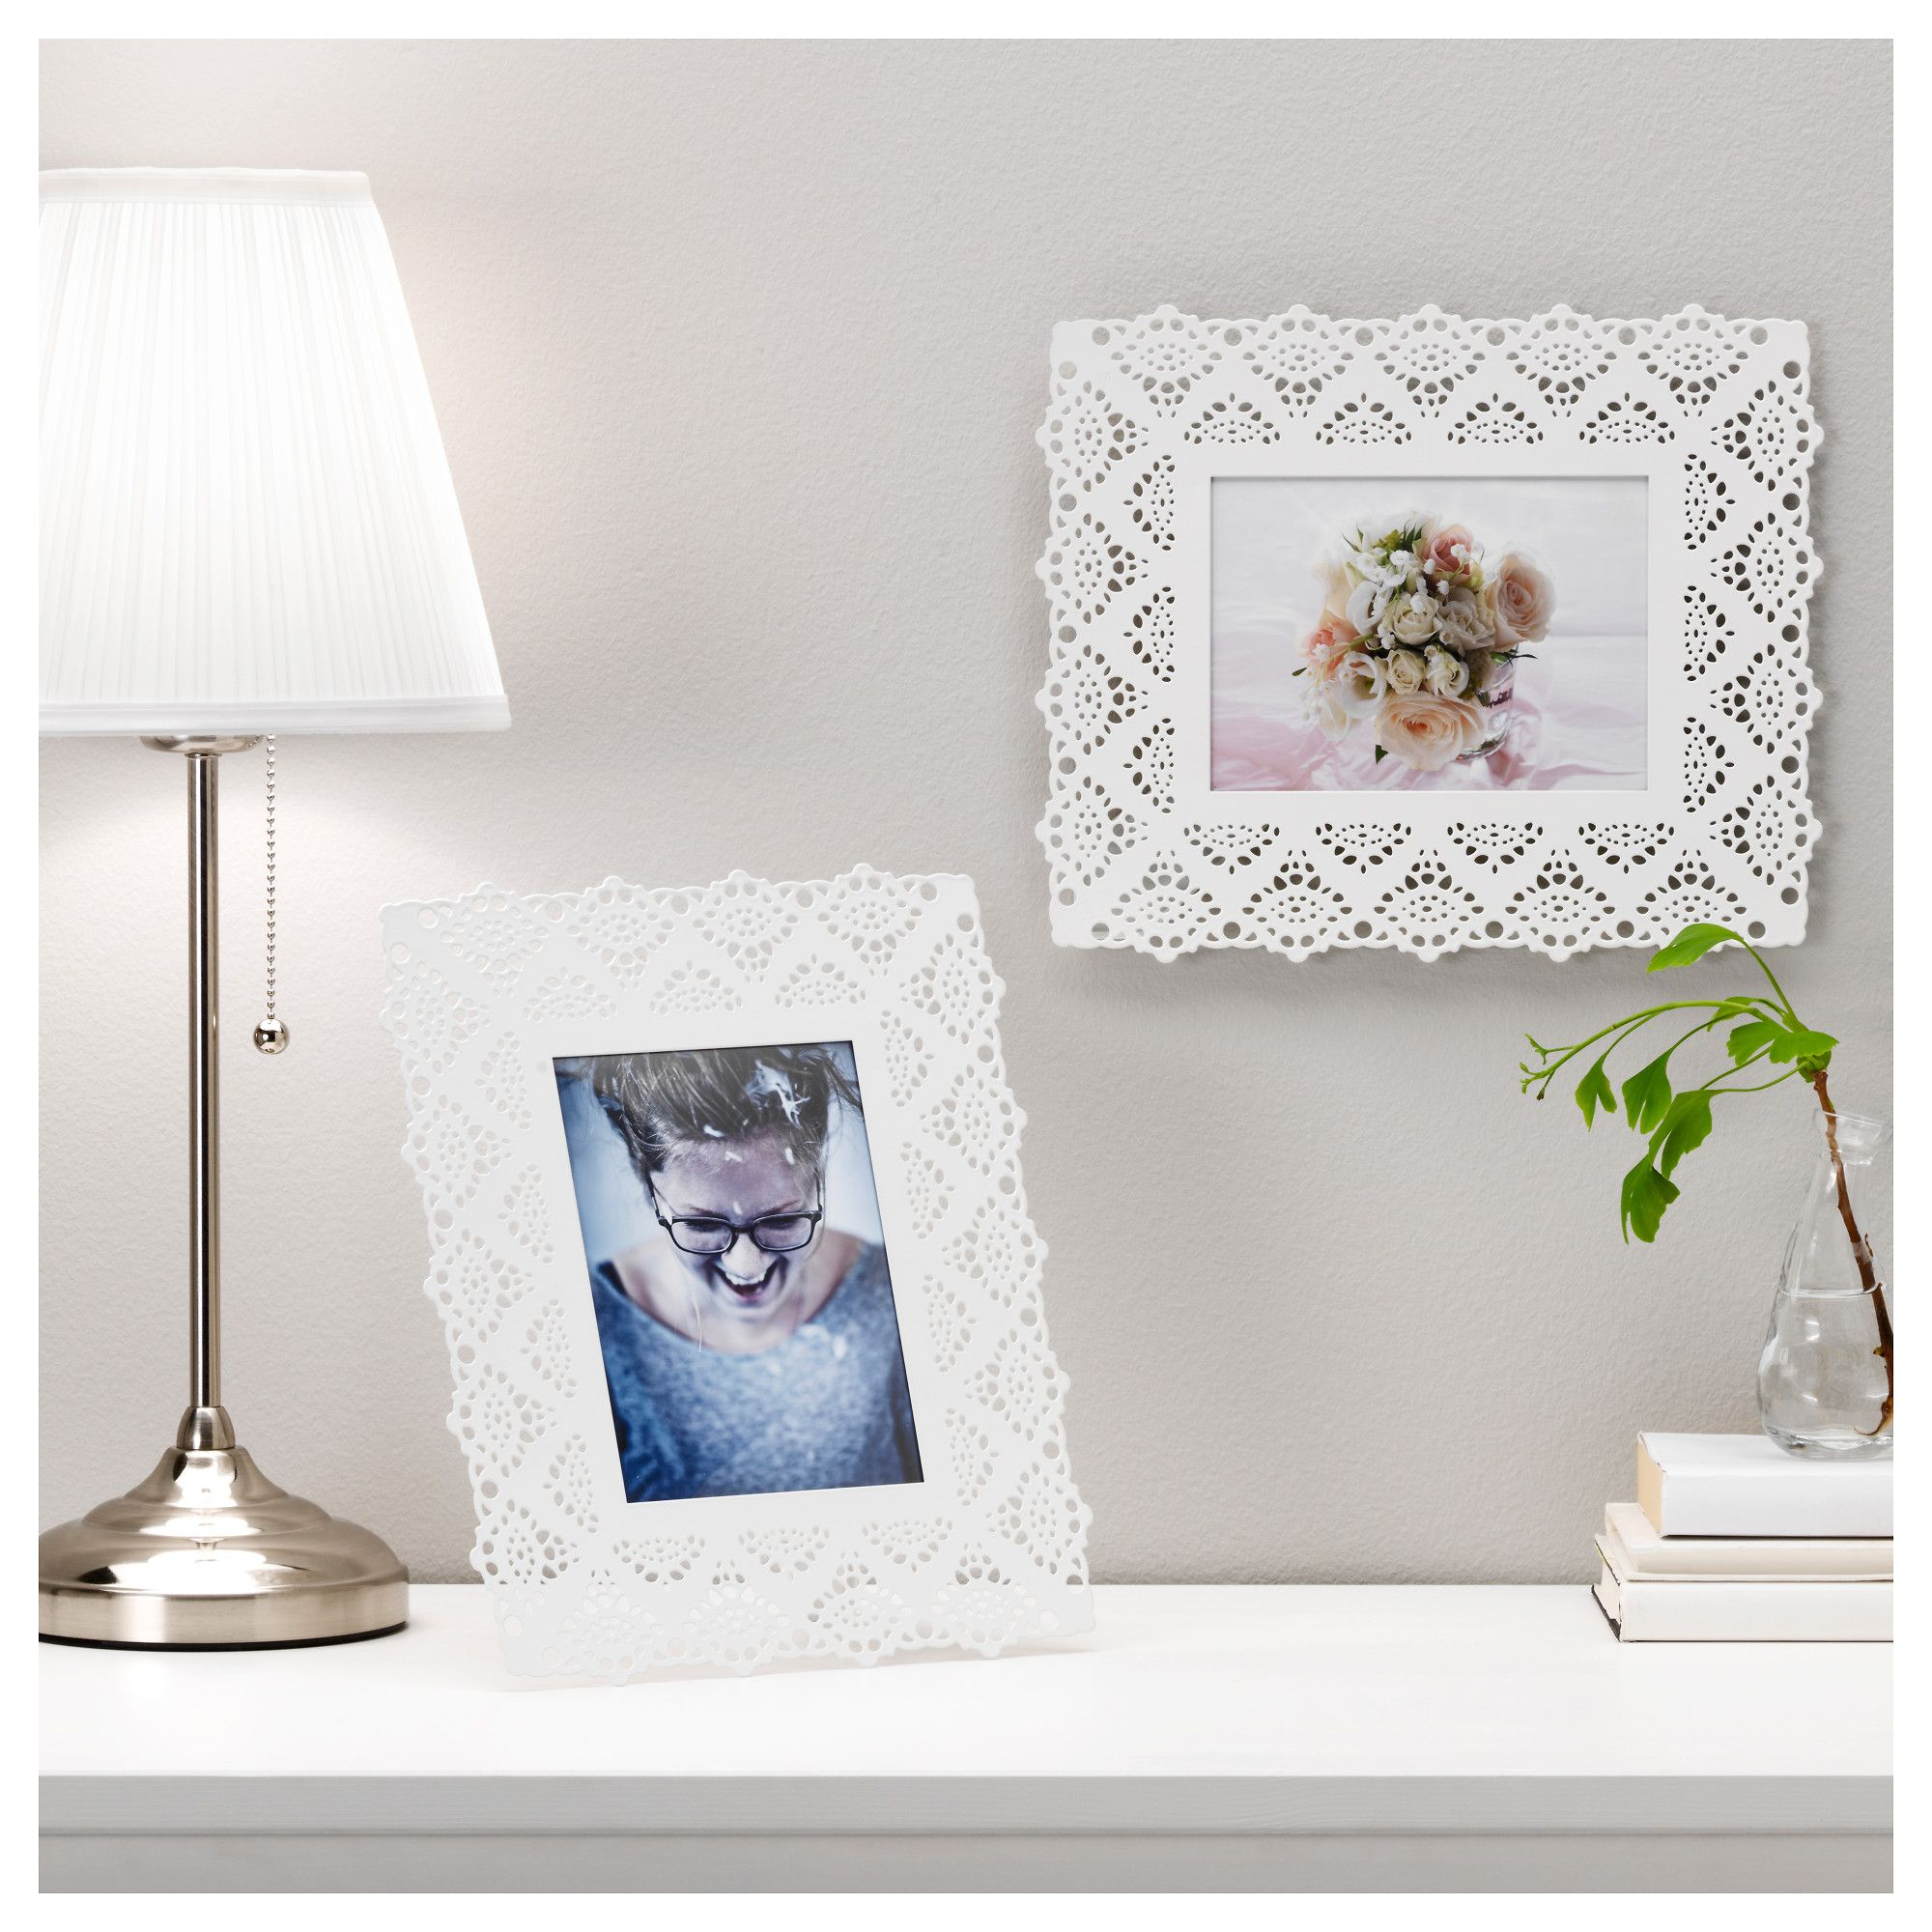 SKURAR Frame White 13x18 cm   Ikea Idea ❤   Pinterest